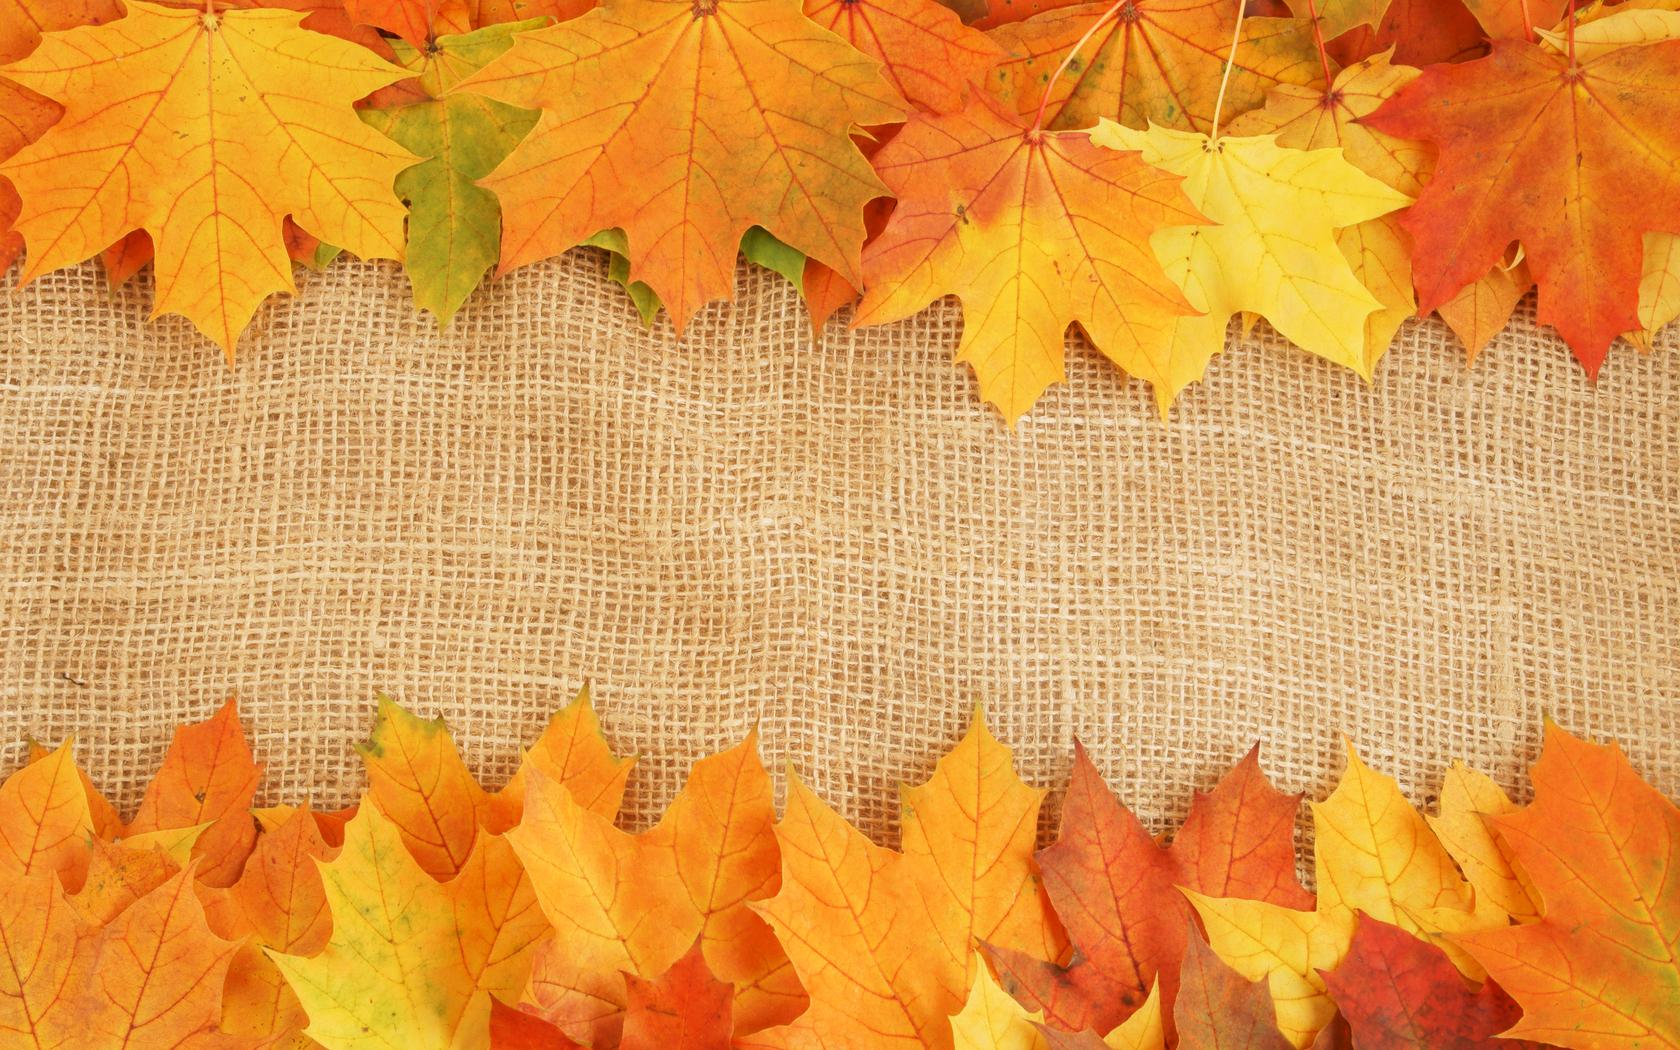 Autumn Leaves Textures Background Autumn Slides